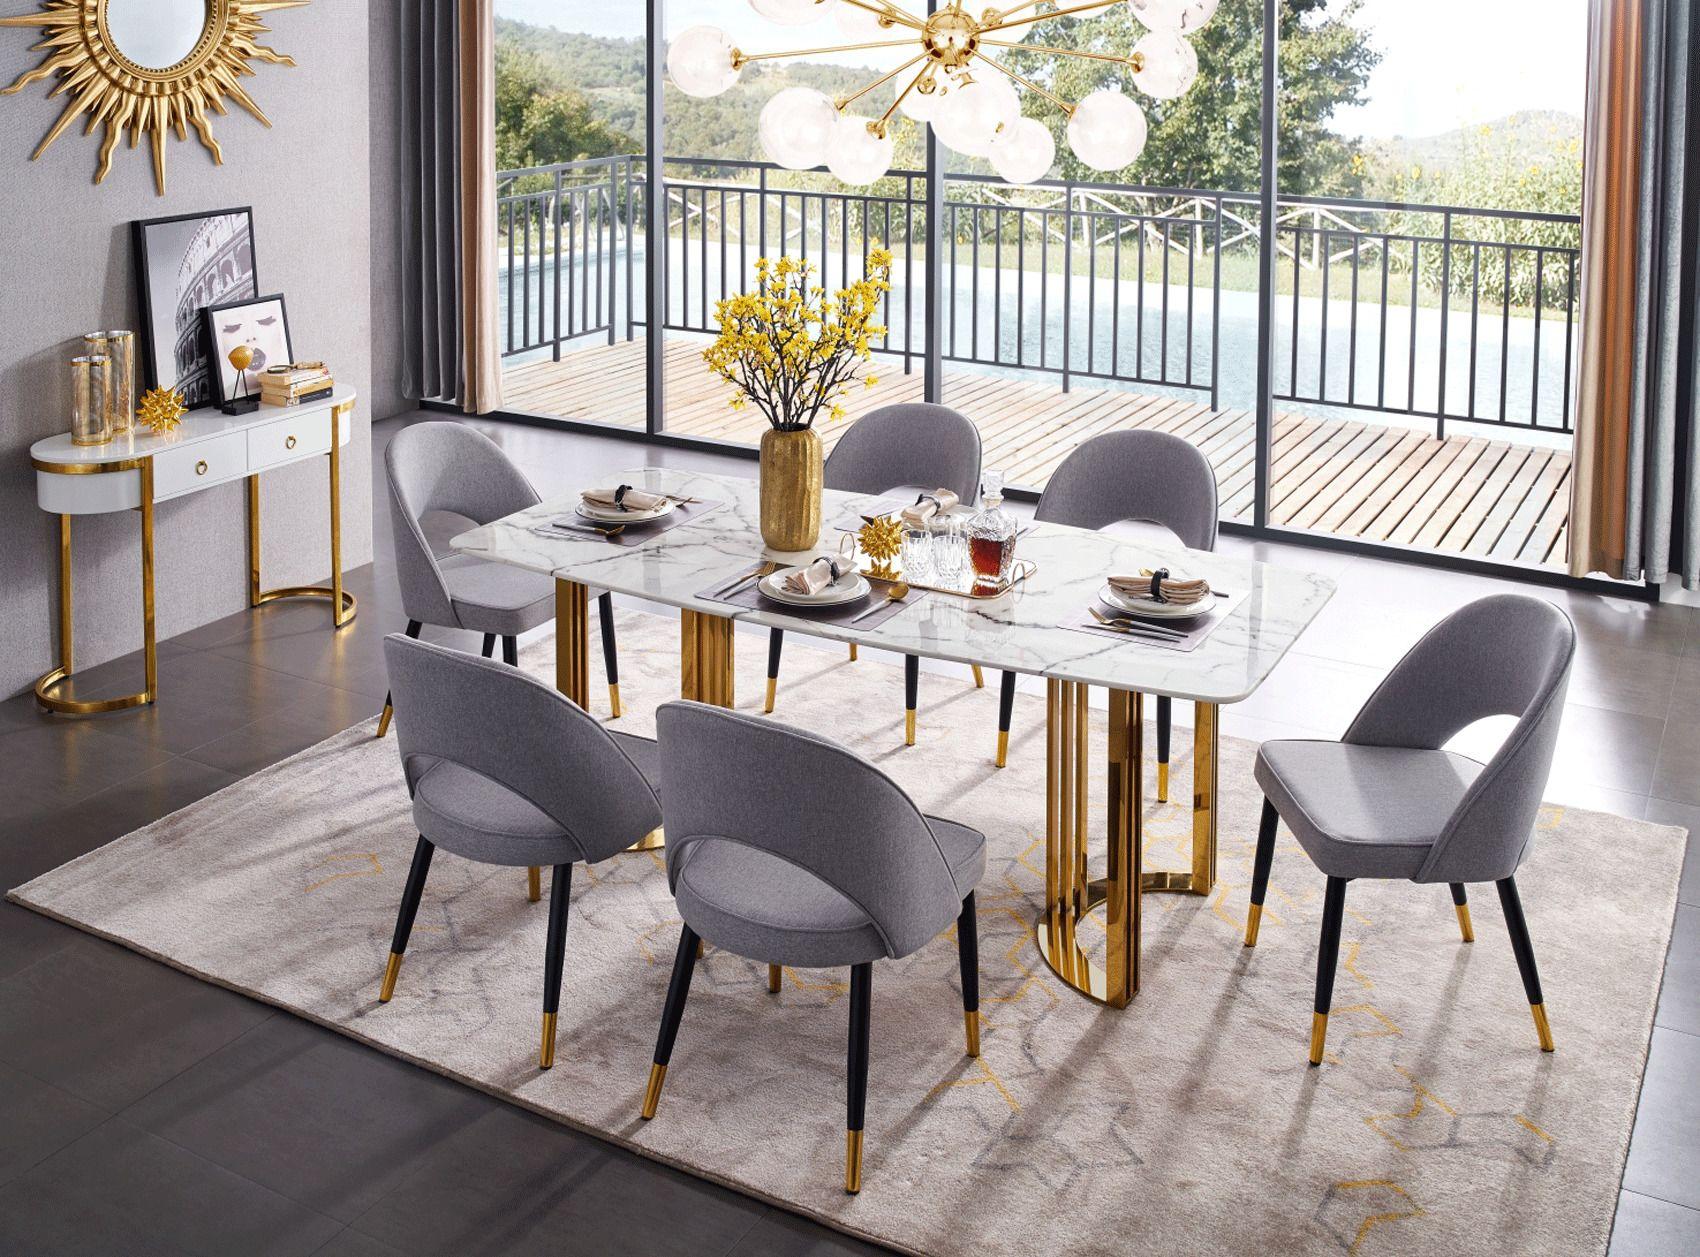 Overnice Modern Dining Room Modern Dining Room Set Marble Top Dining Table Dining Table Marble